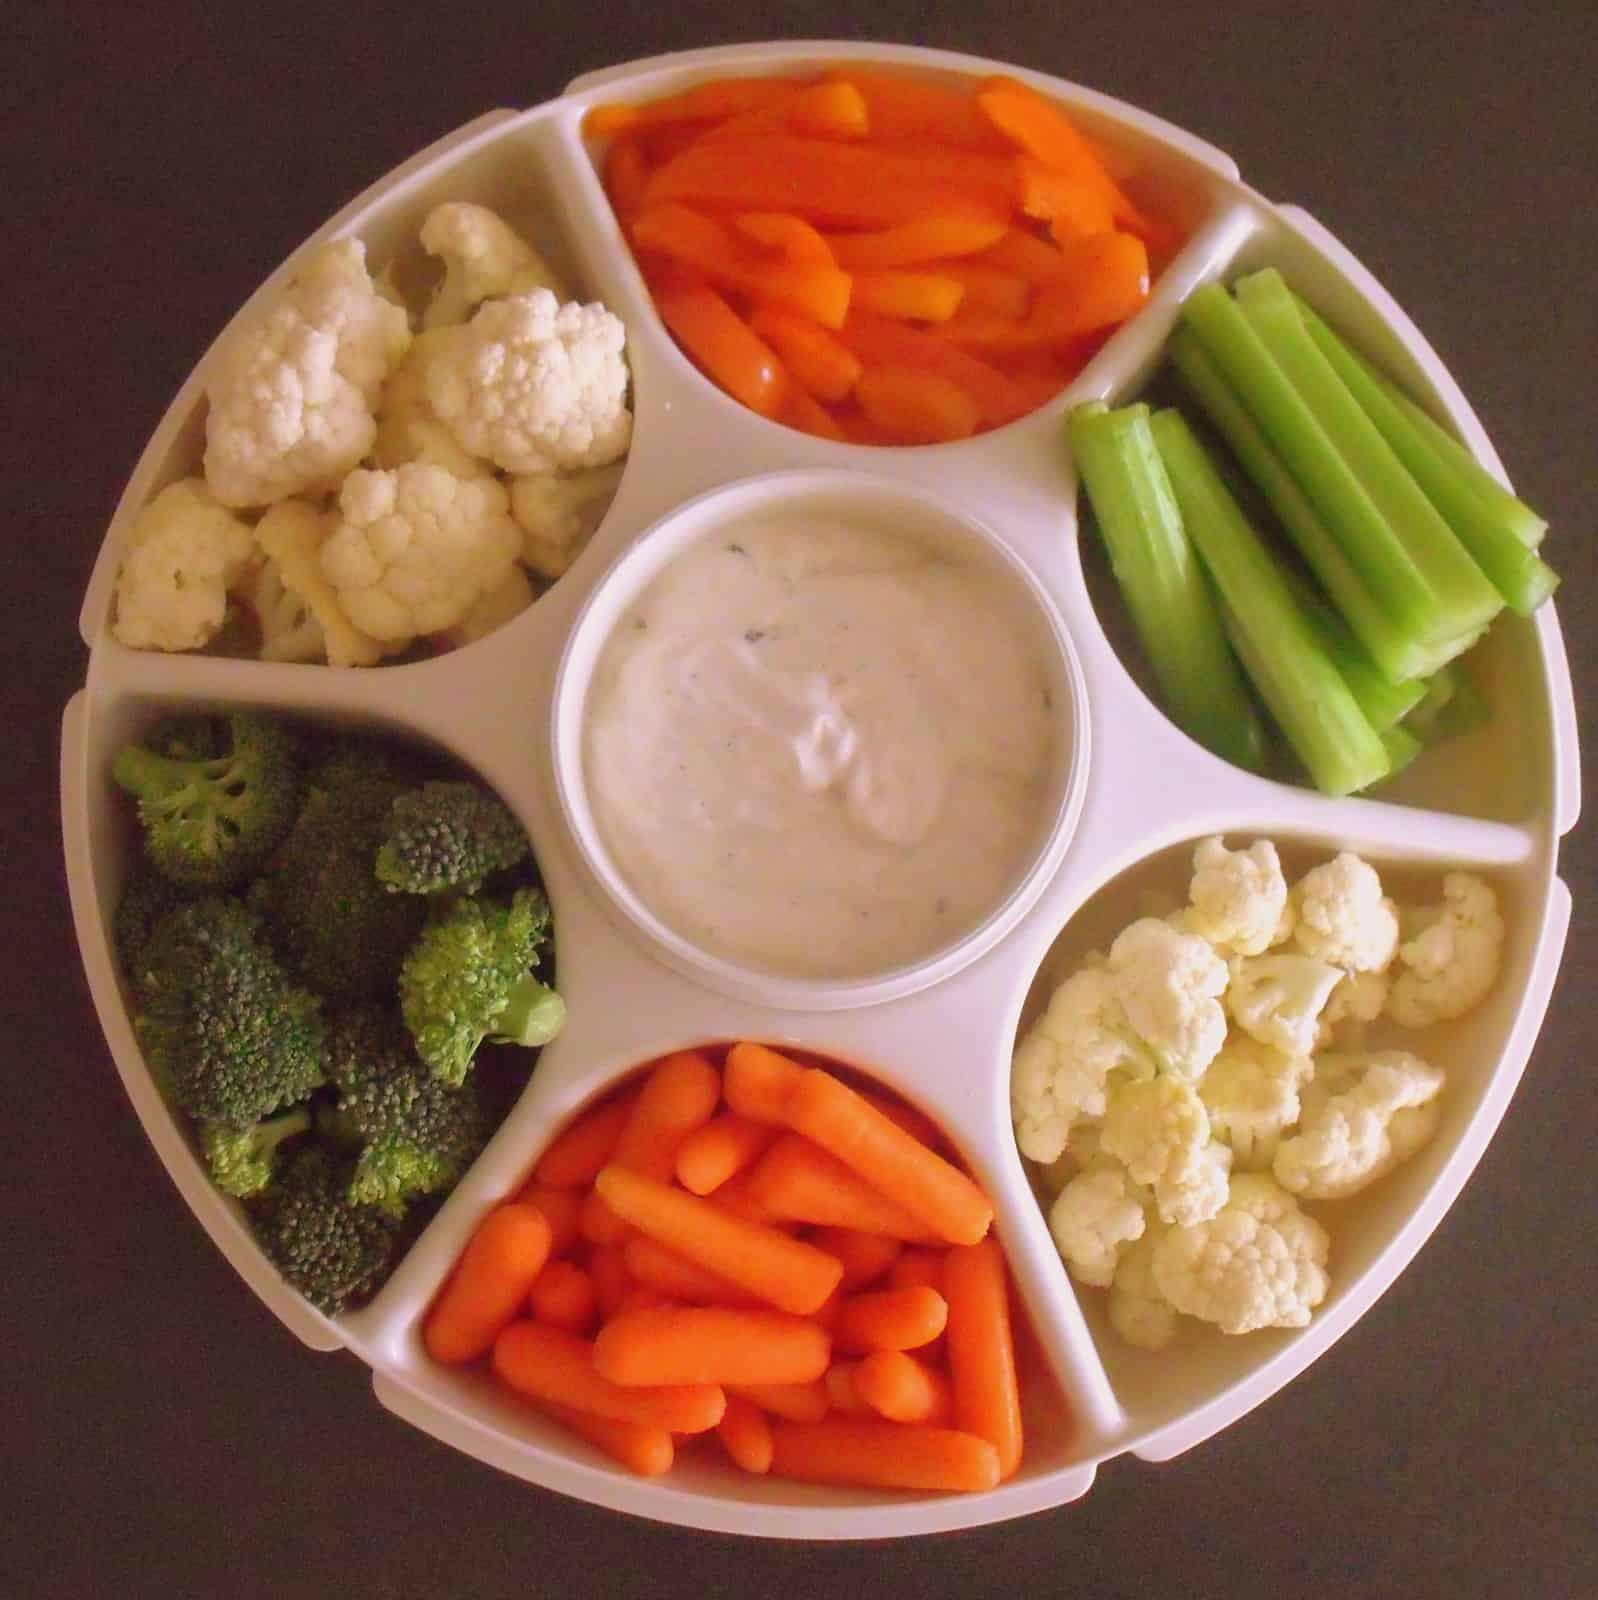 Easy Veggie Tray For St. Patrick's Day